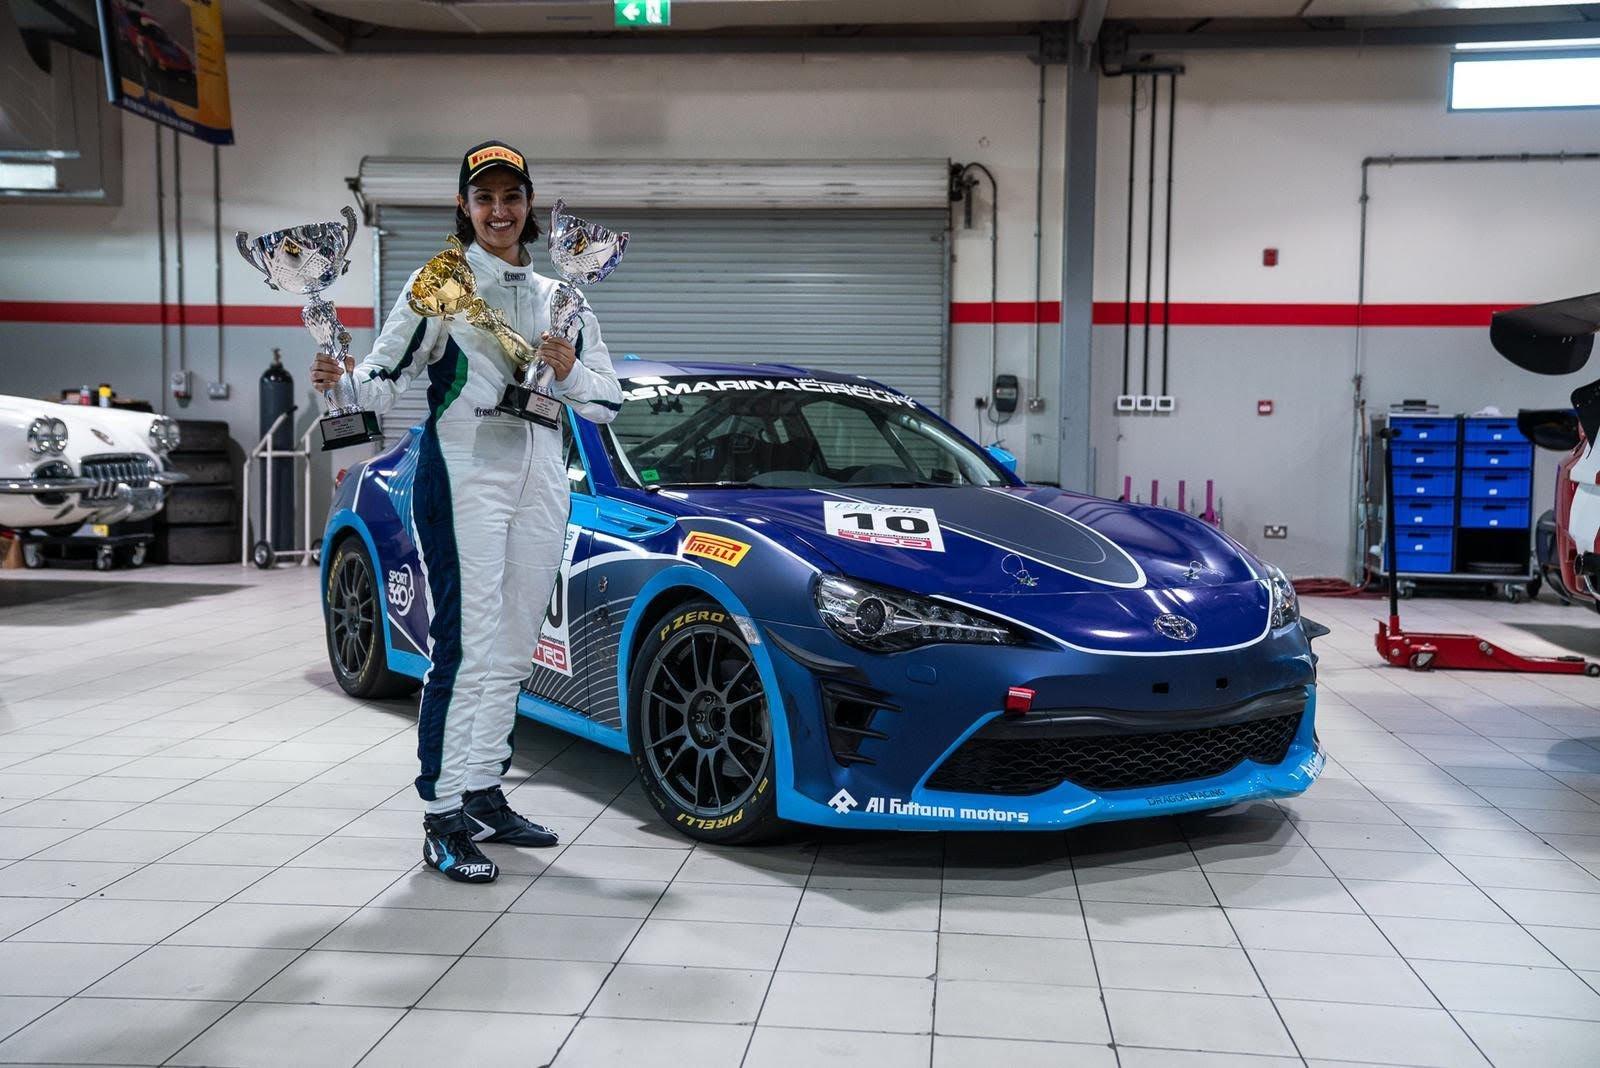 Saudi Arabia keen on hosting women racers along with F1 GP